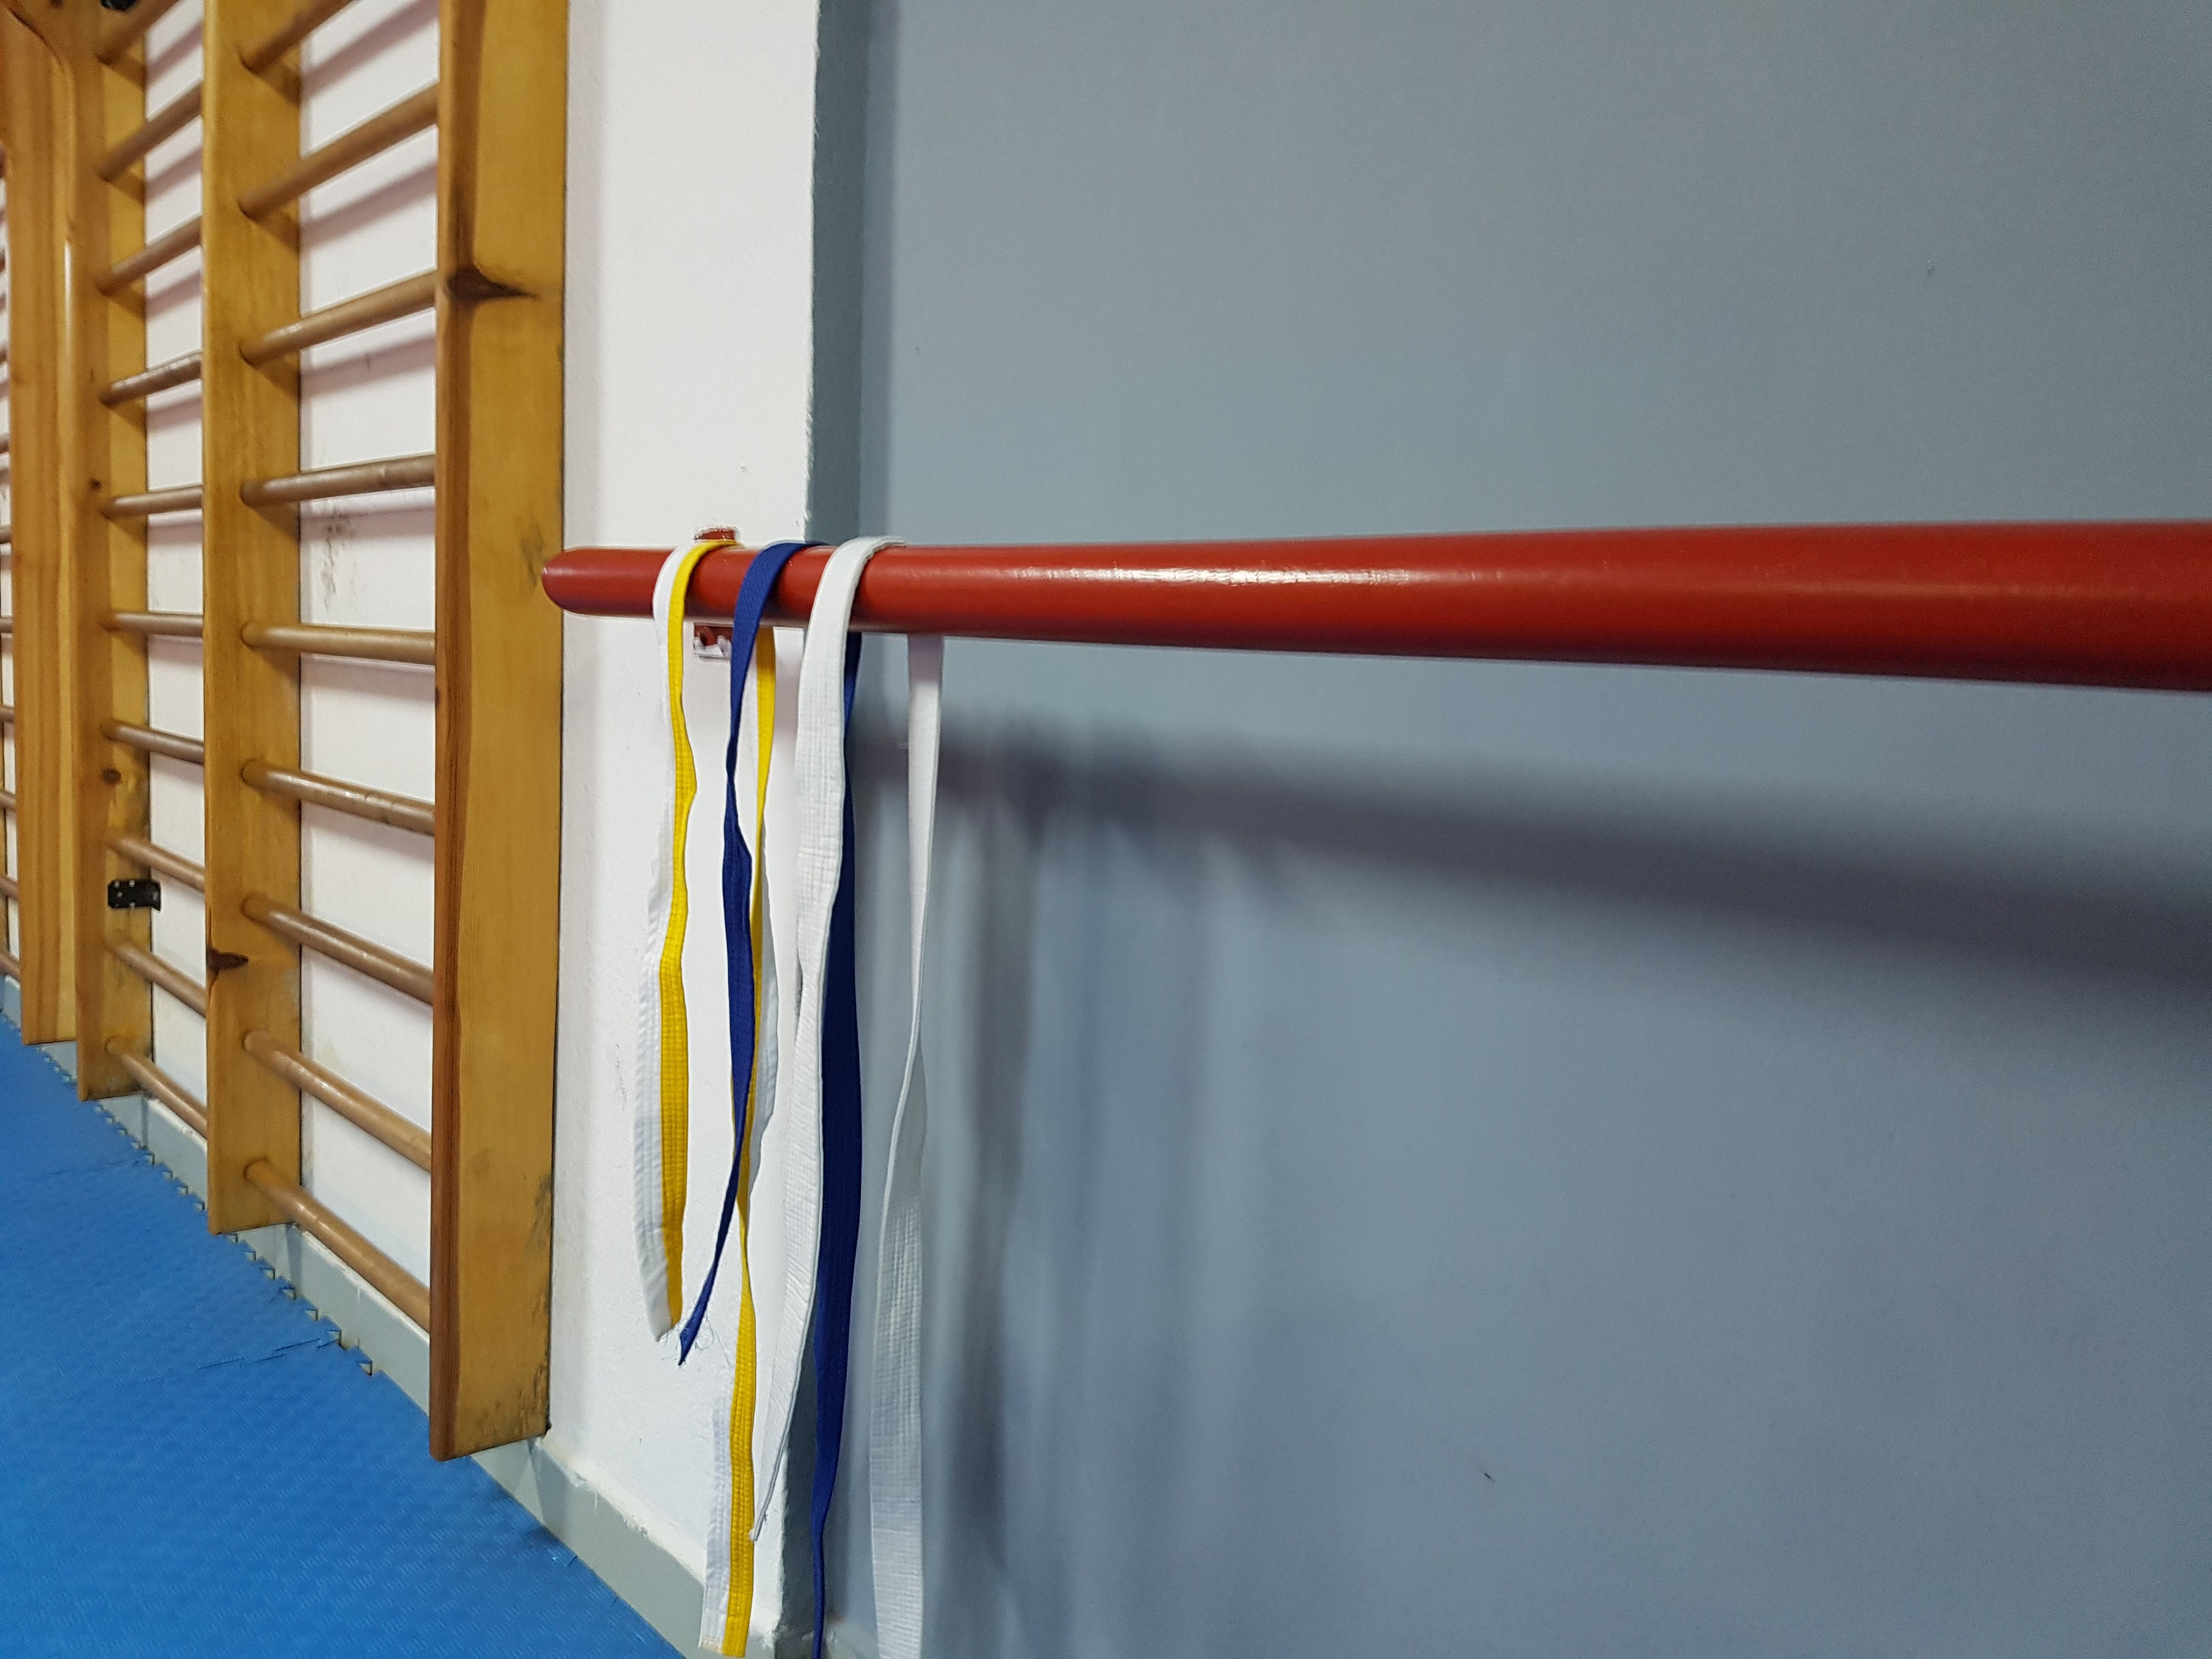 Free stock photo of graduation day taekwondo dojo gym